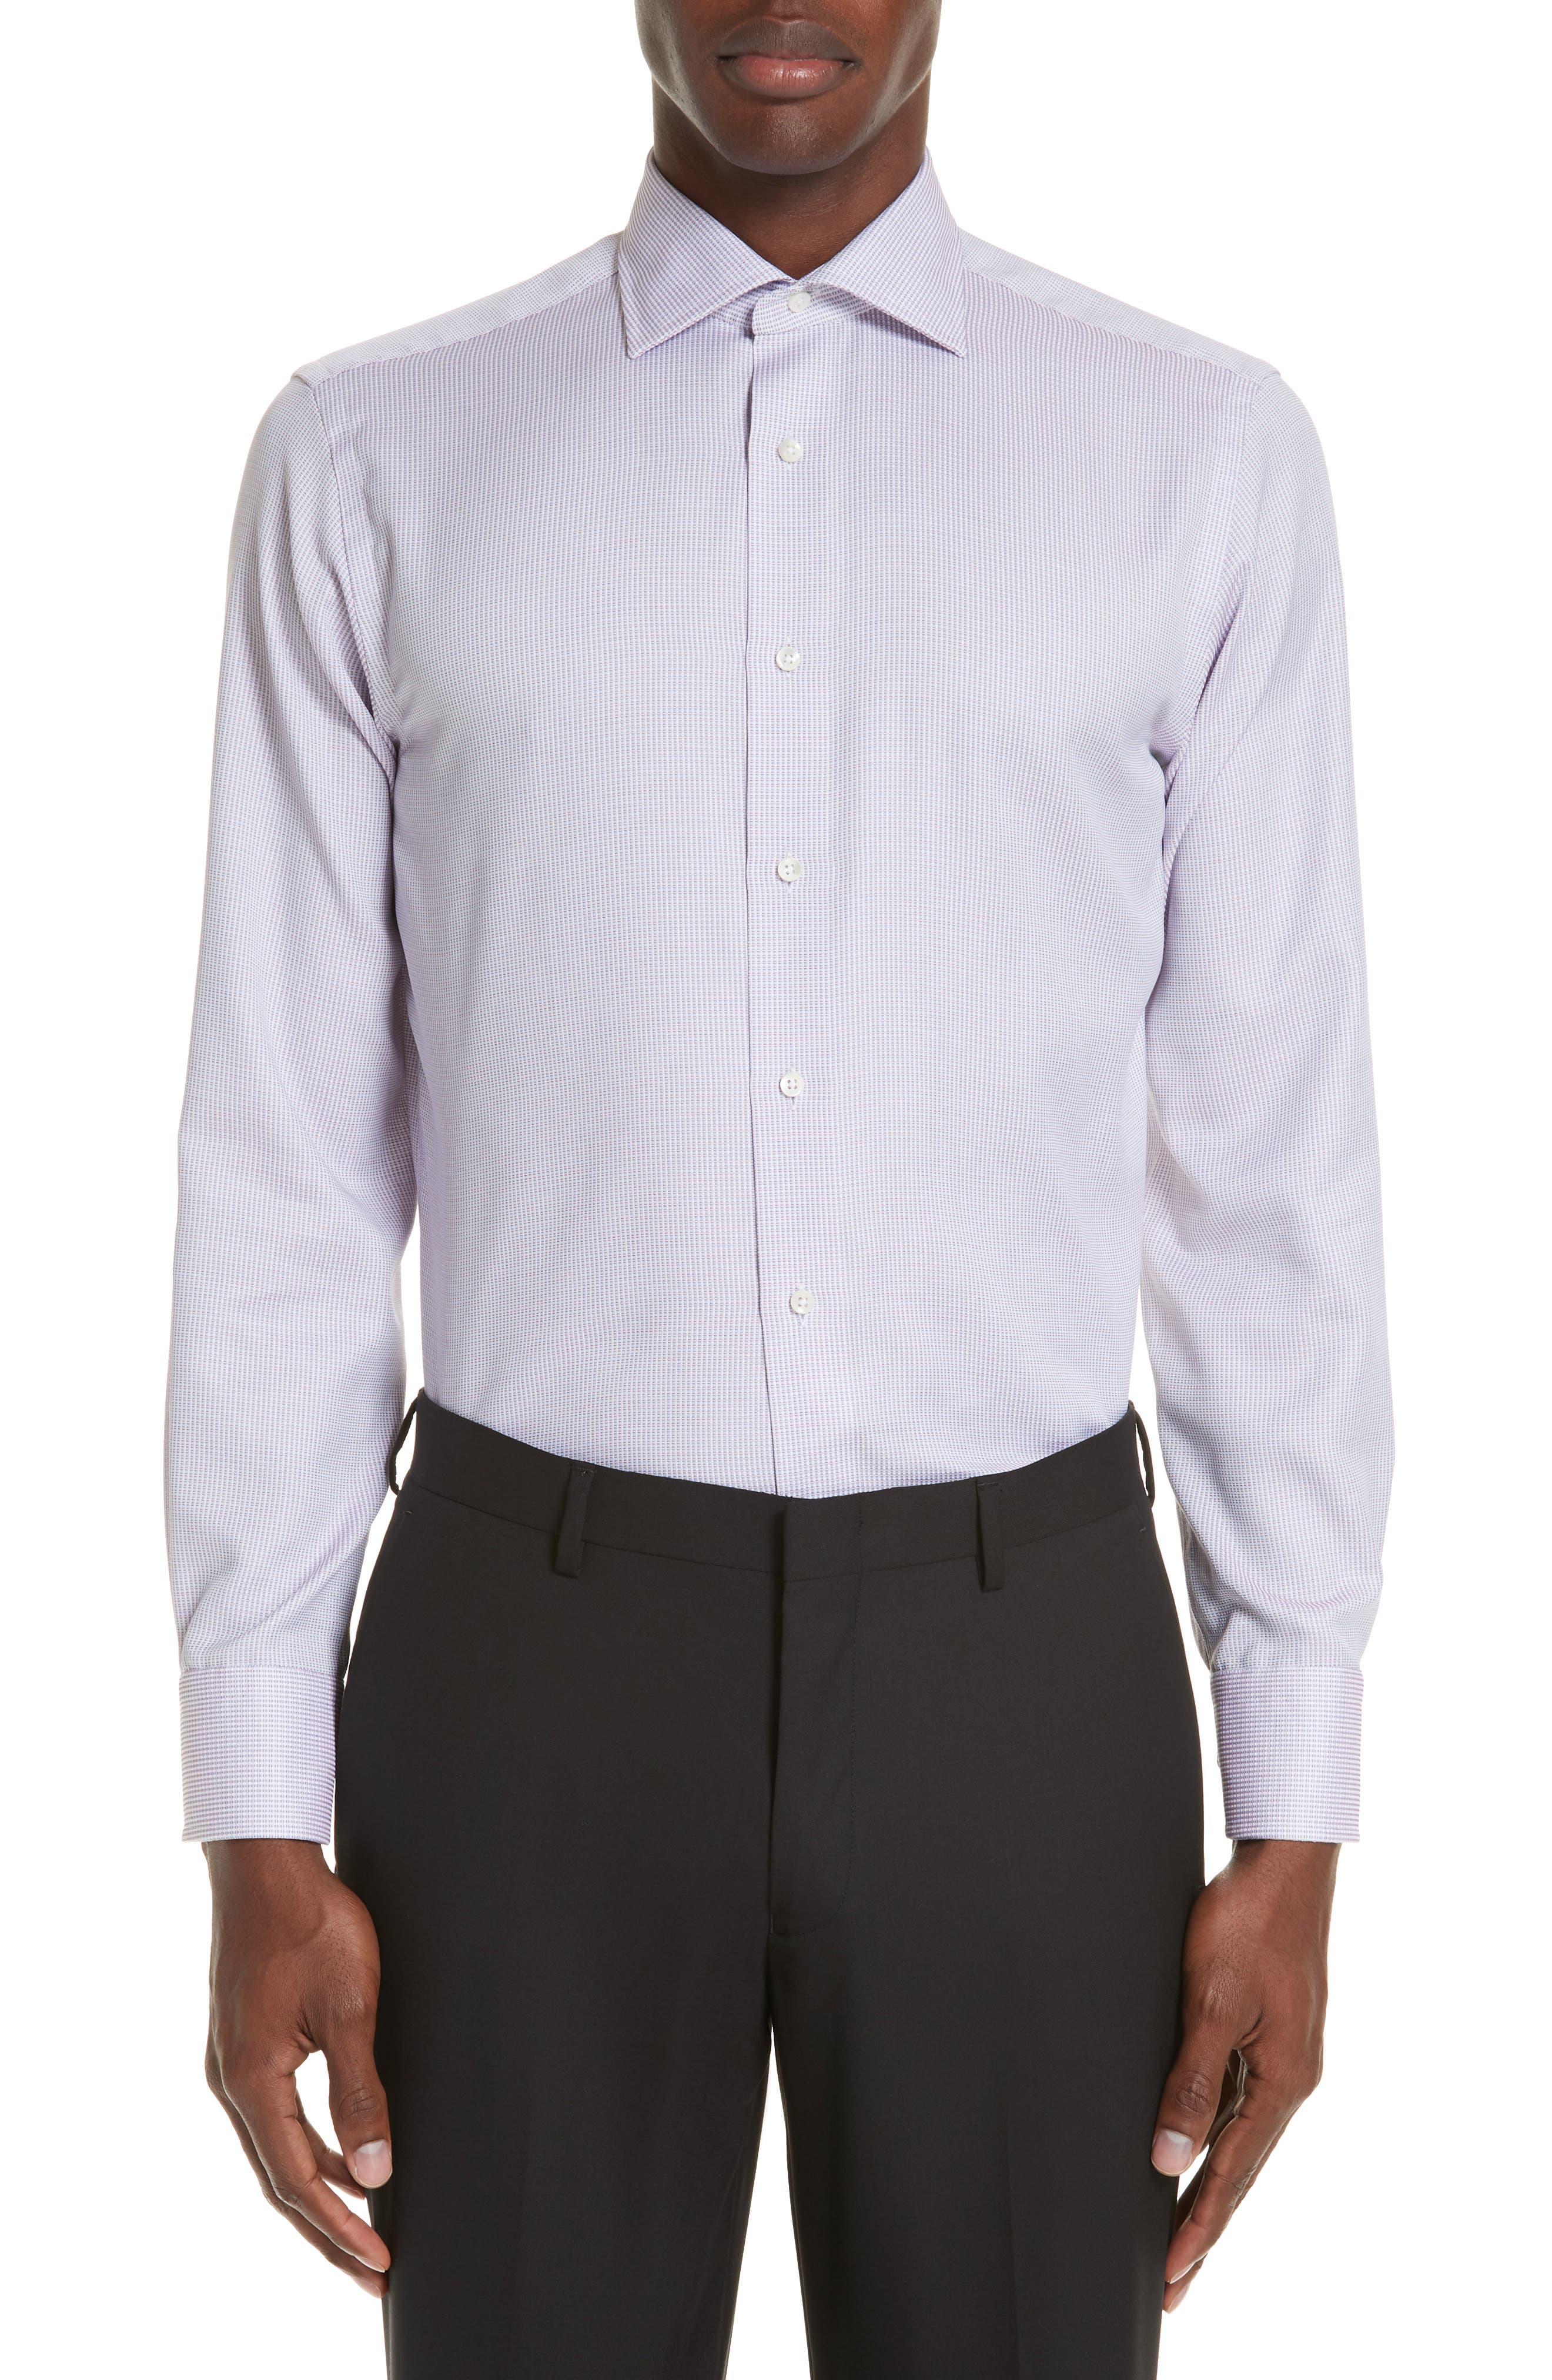 Regular Fit Stripe Dress Shirt,                             Main thumbnail 1, color,                             LIGHT PINK